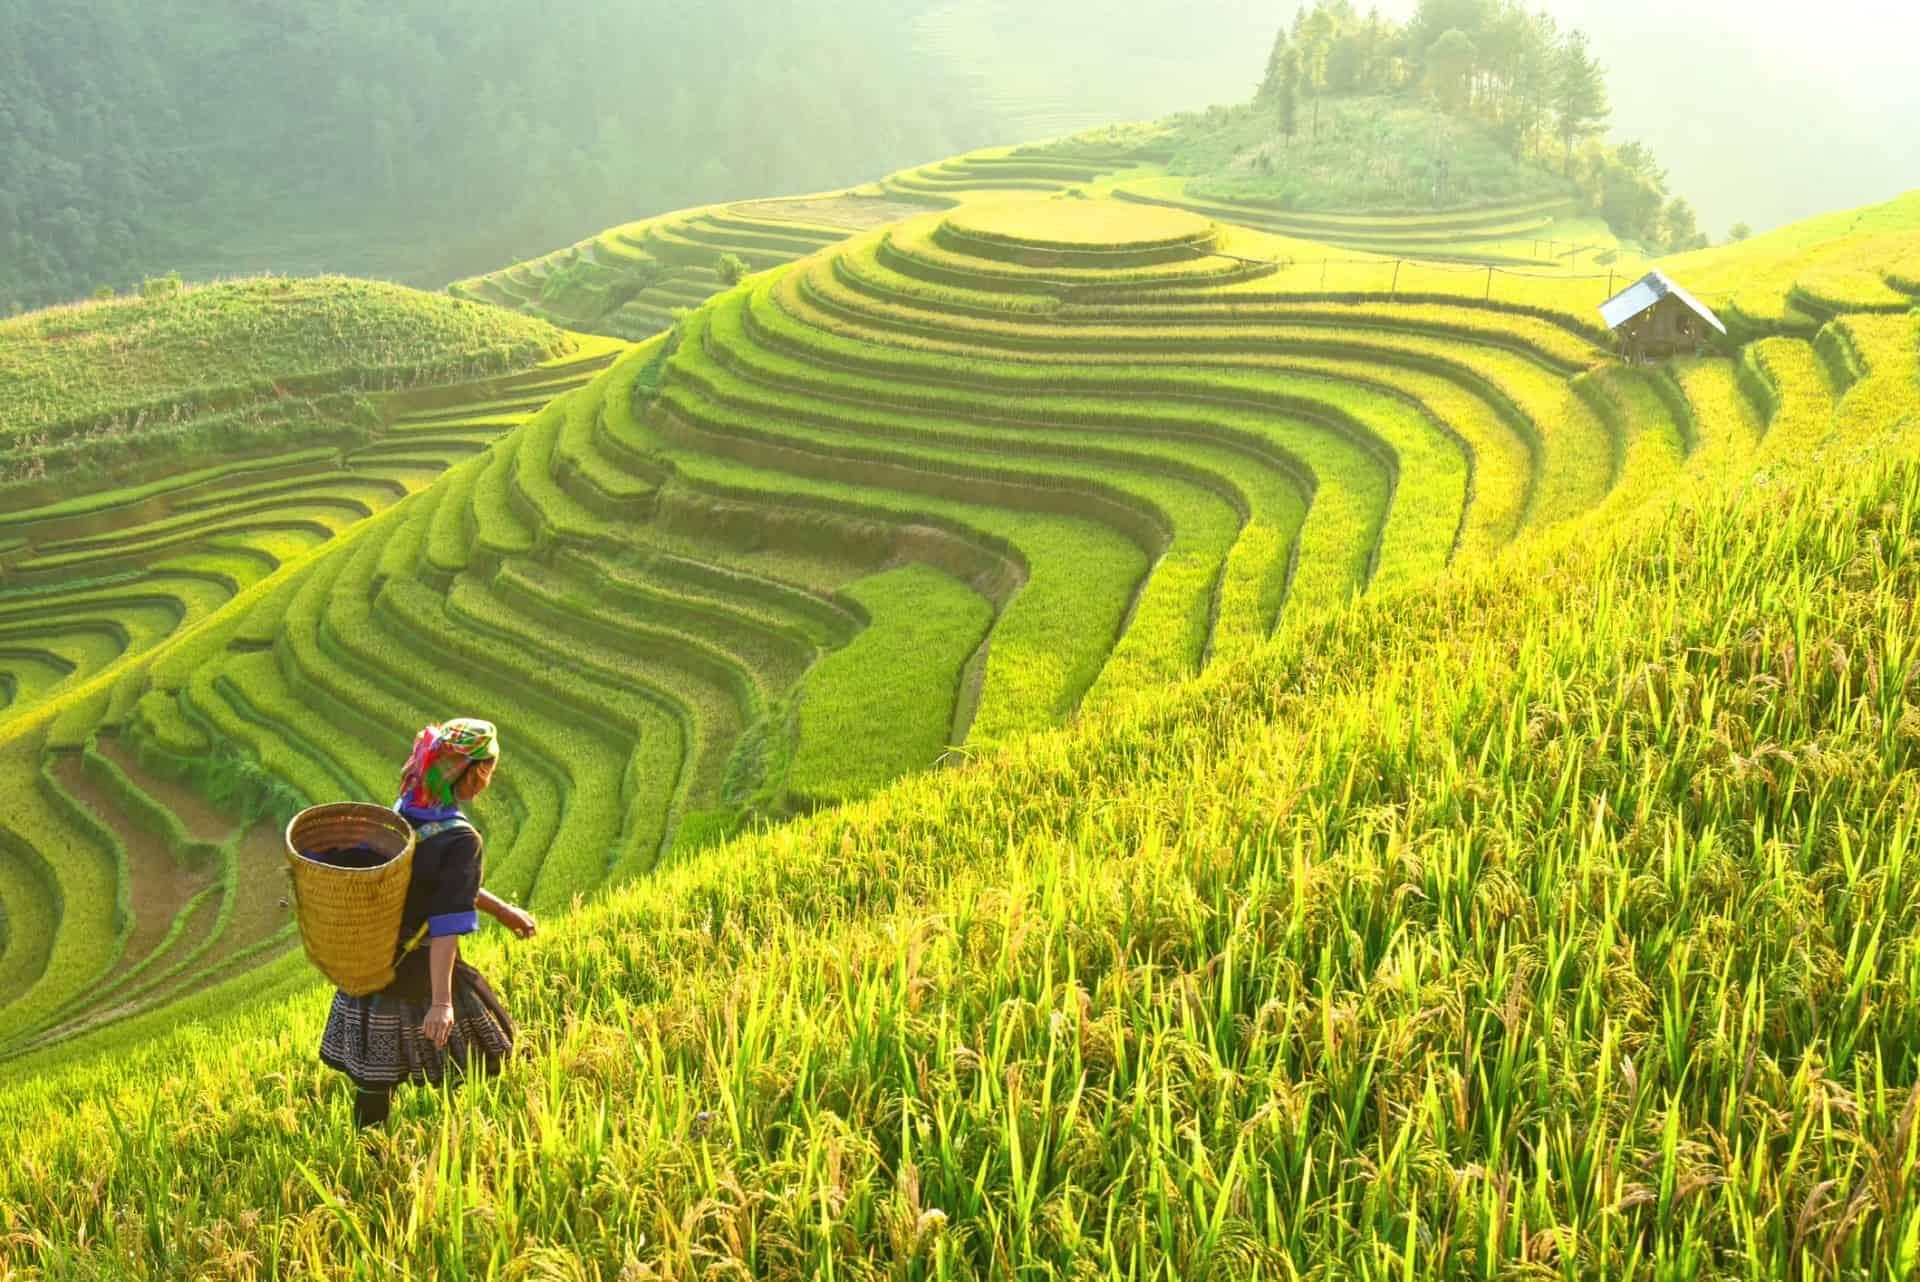 Rice fields on terraced of Mu Cang Chai, YenBai, in northwest Vietnam